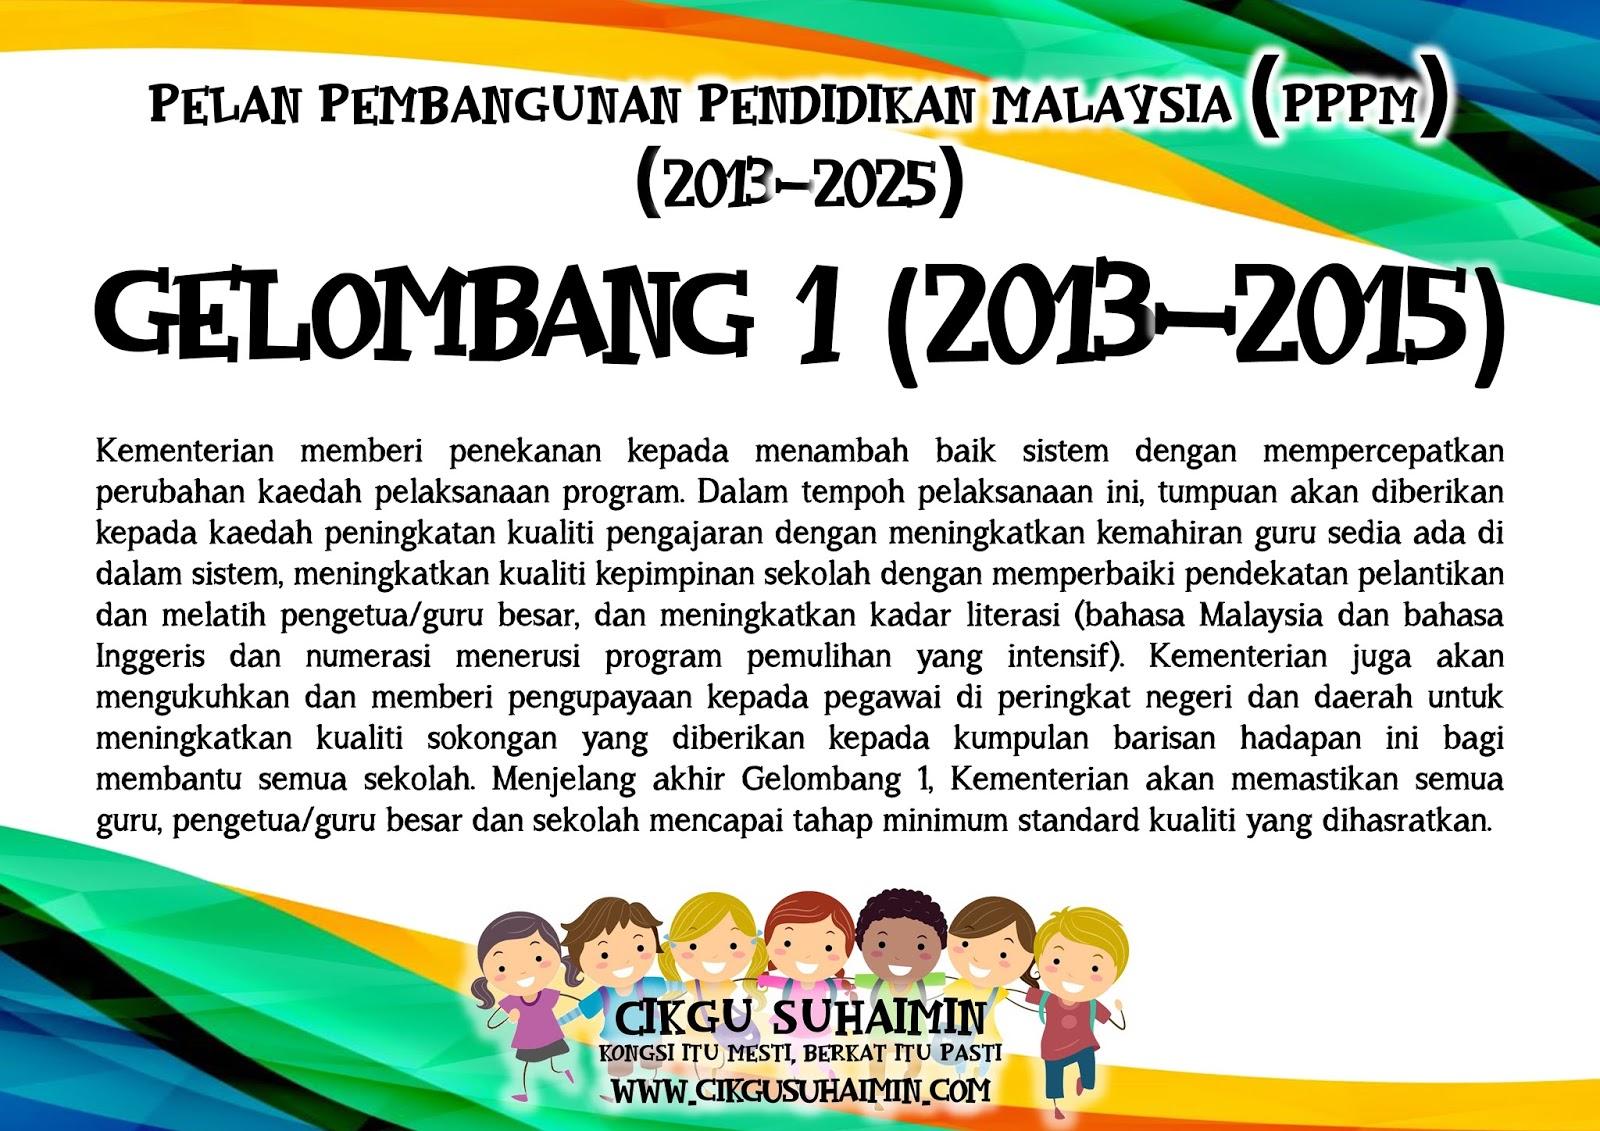 3 Gelombang Pelan Pembangunan Pendidikan Malaysia Pppm 2013 2025